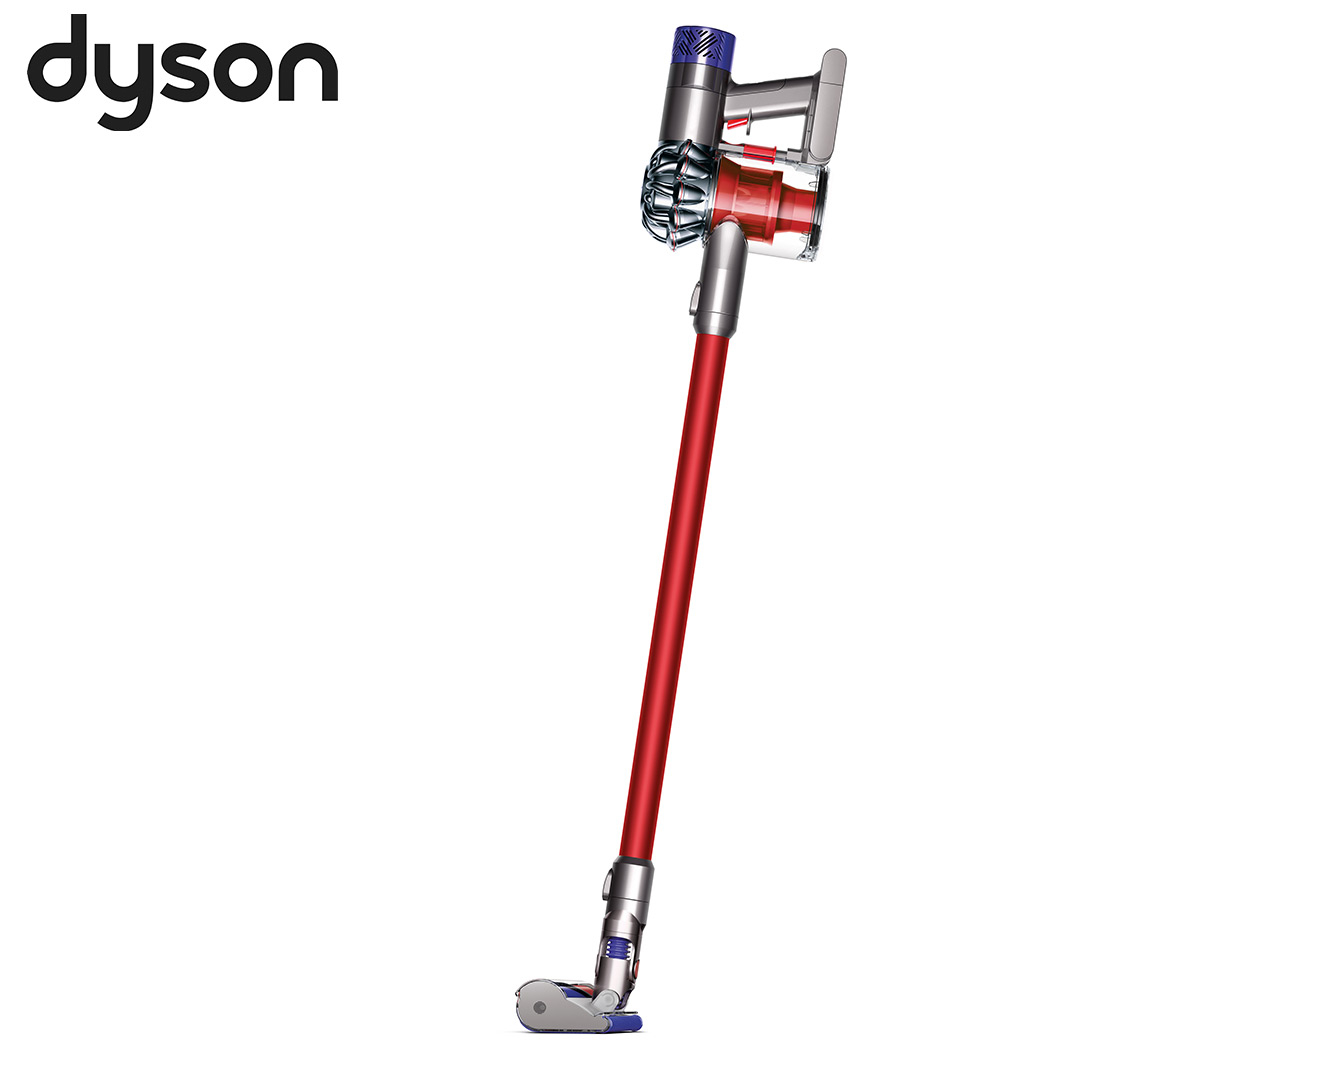 Dyson v6 absolute deals